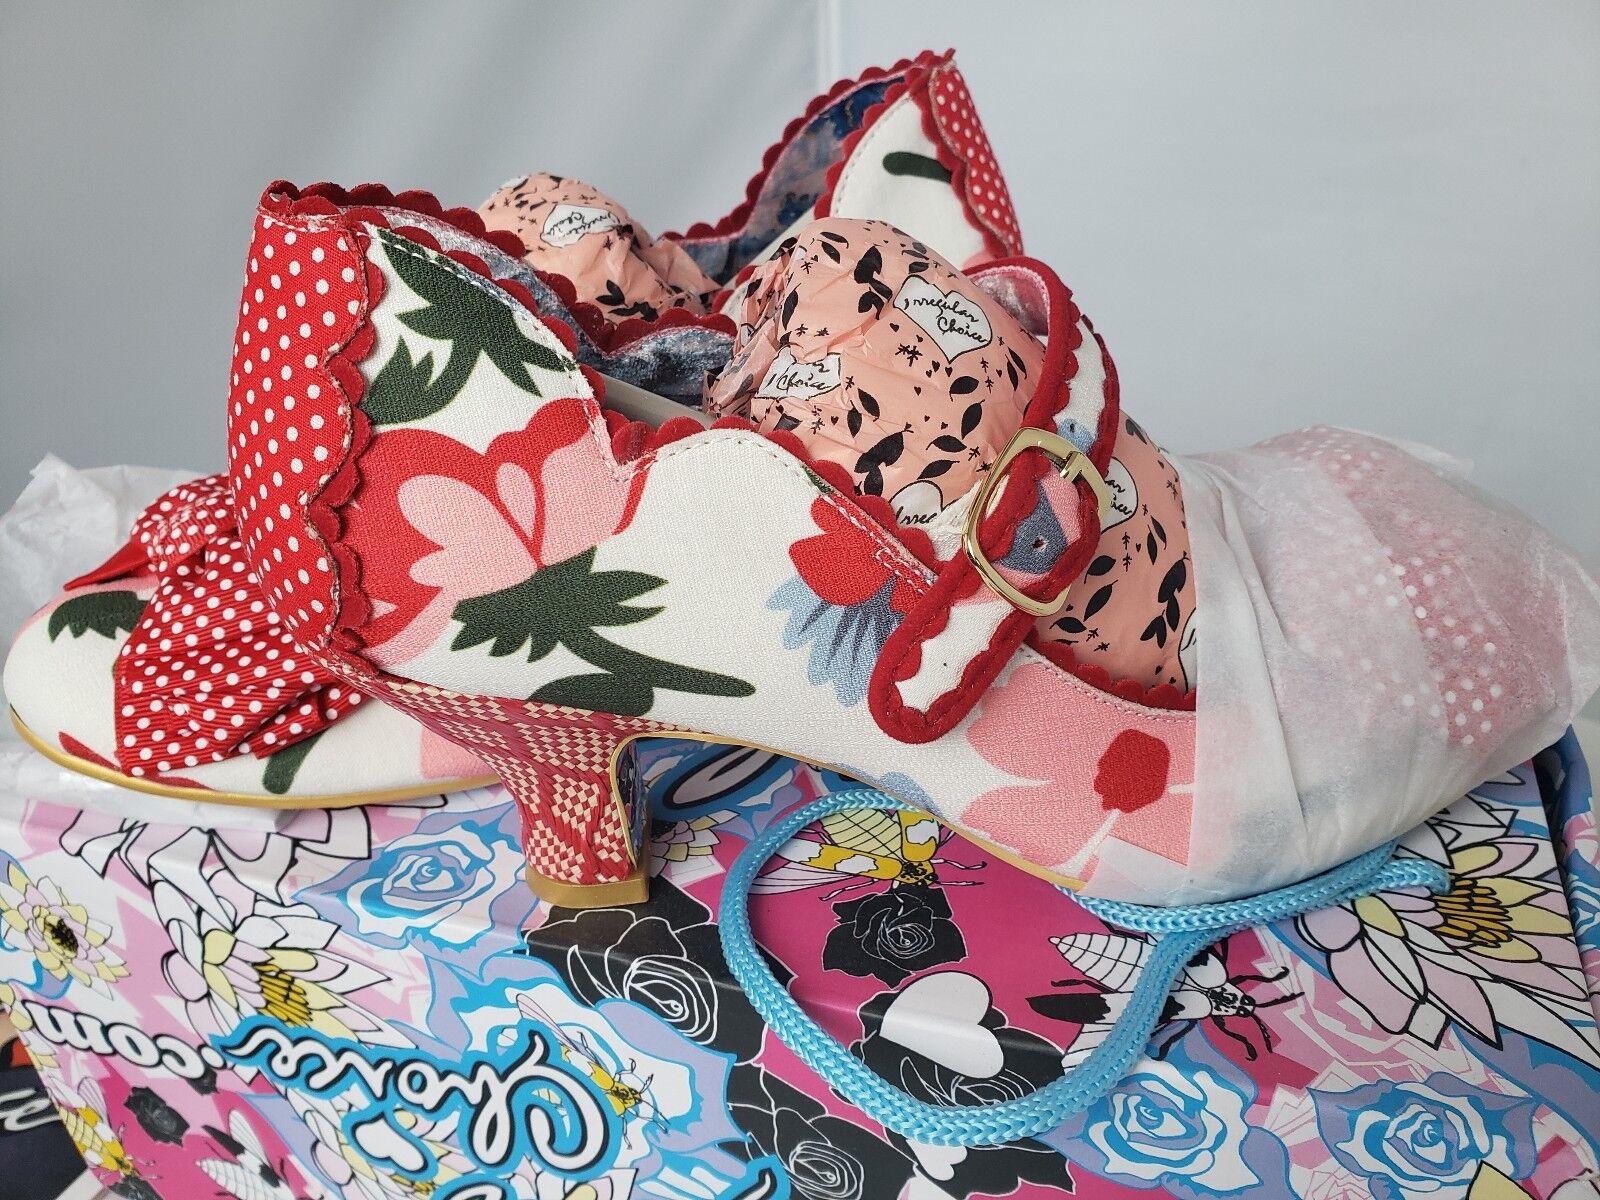 Irregular Choice 37 6.5 Noches De Mujer Zapatos de tacón tacón tacón medio la Floral De Fiesta Zapatos De Salón  compra limitada